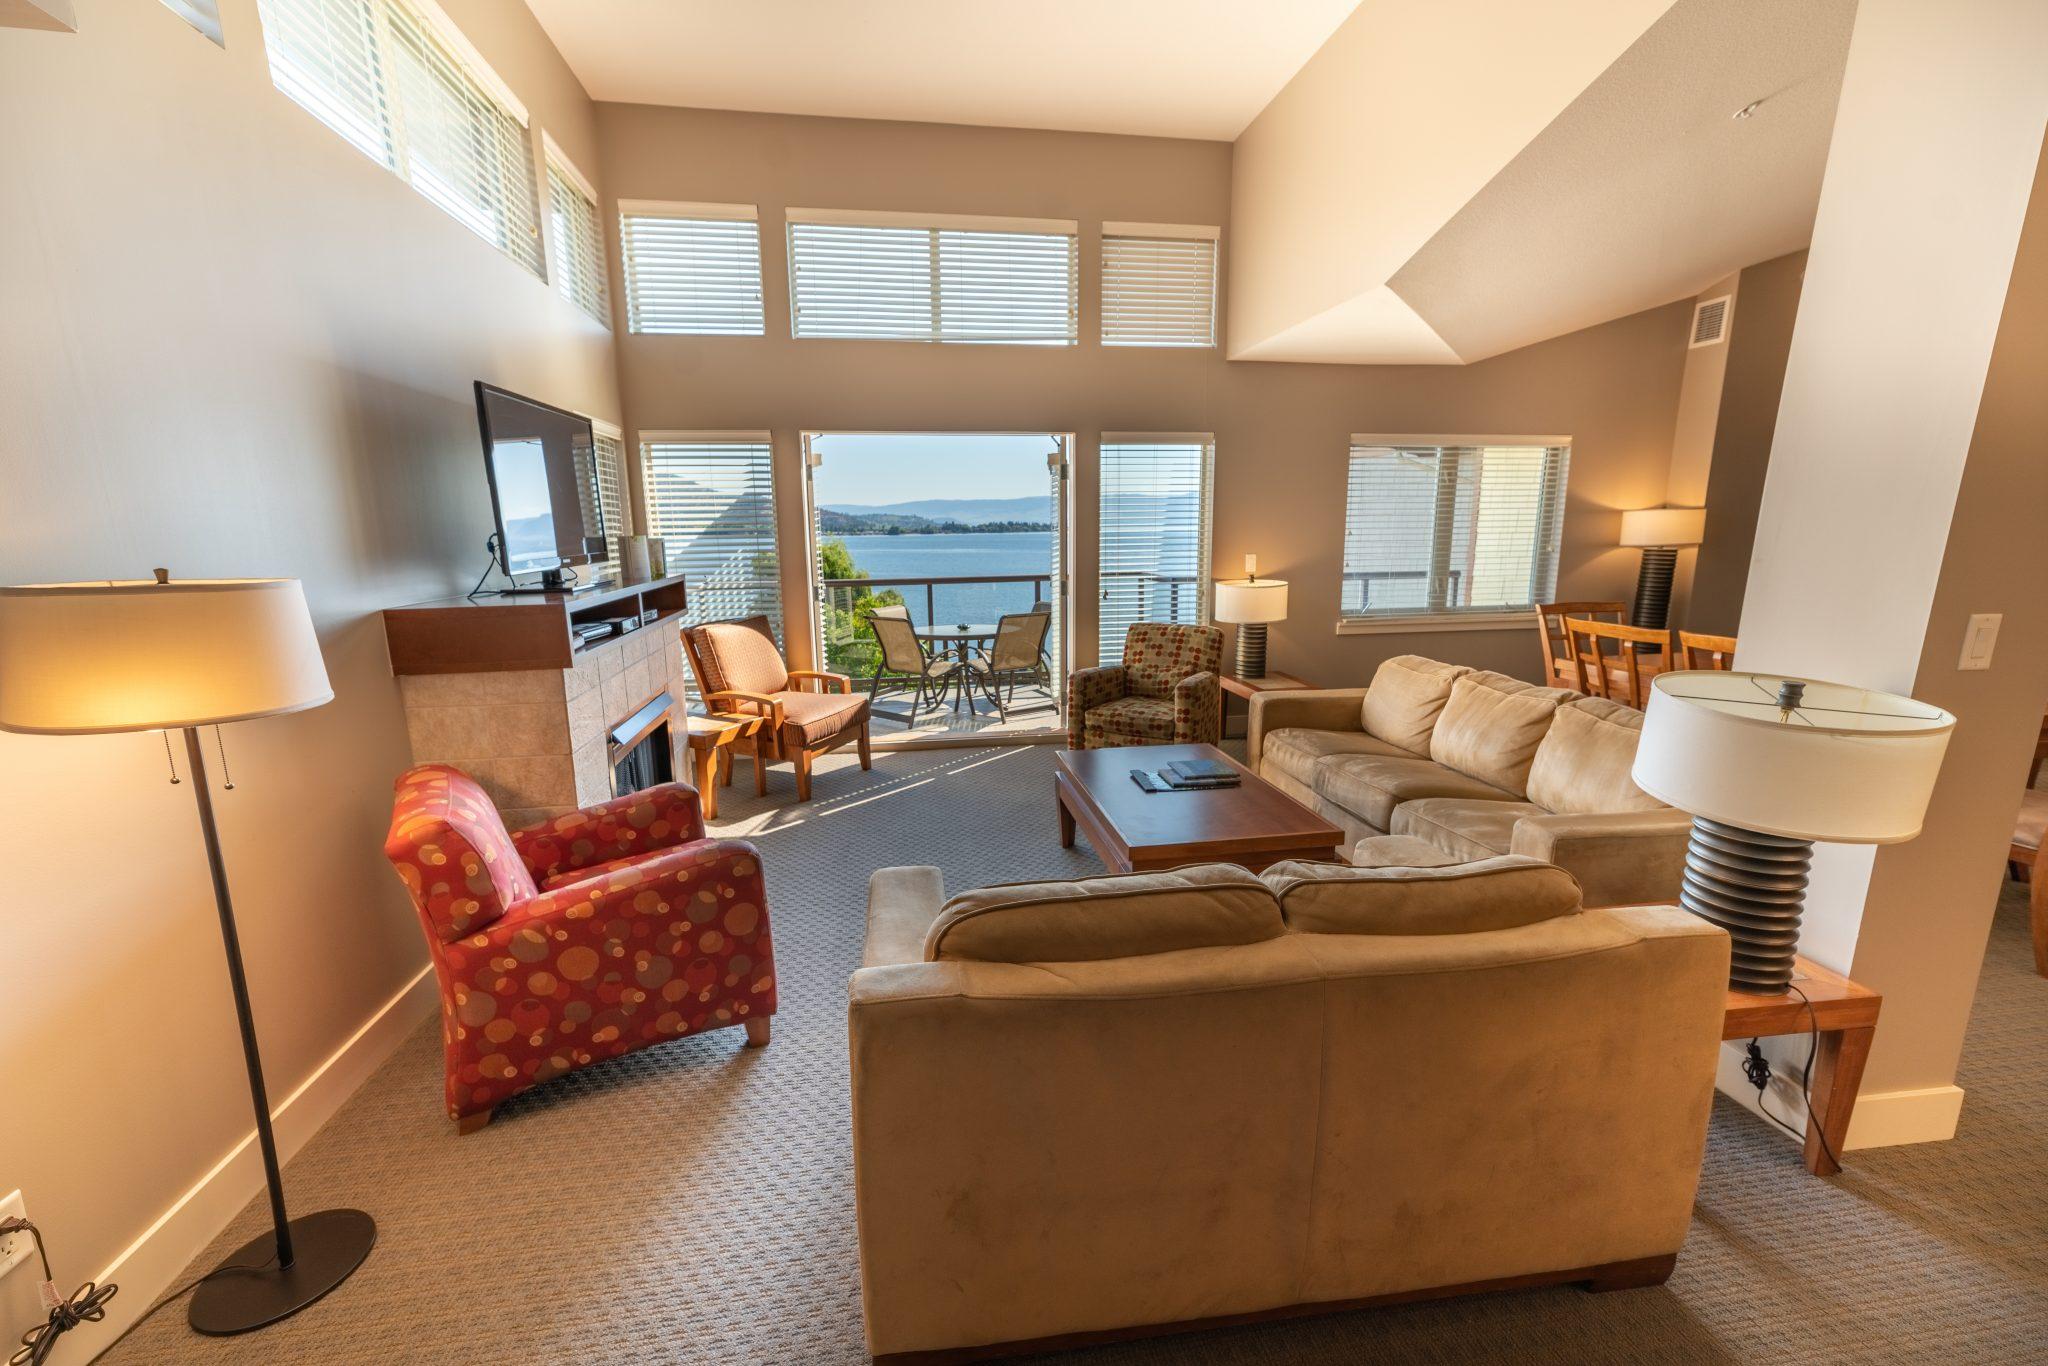 The-Cove-Lakeside-Resort-5